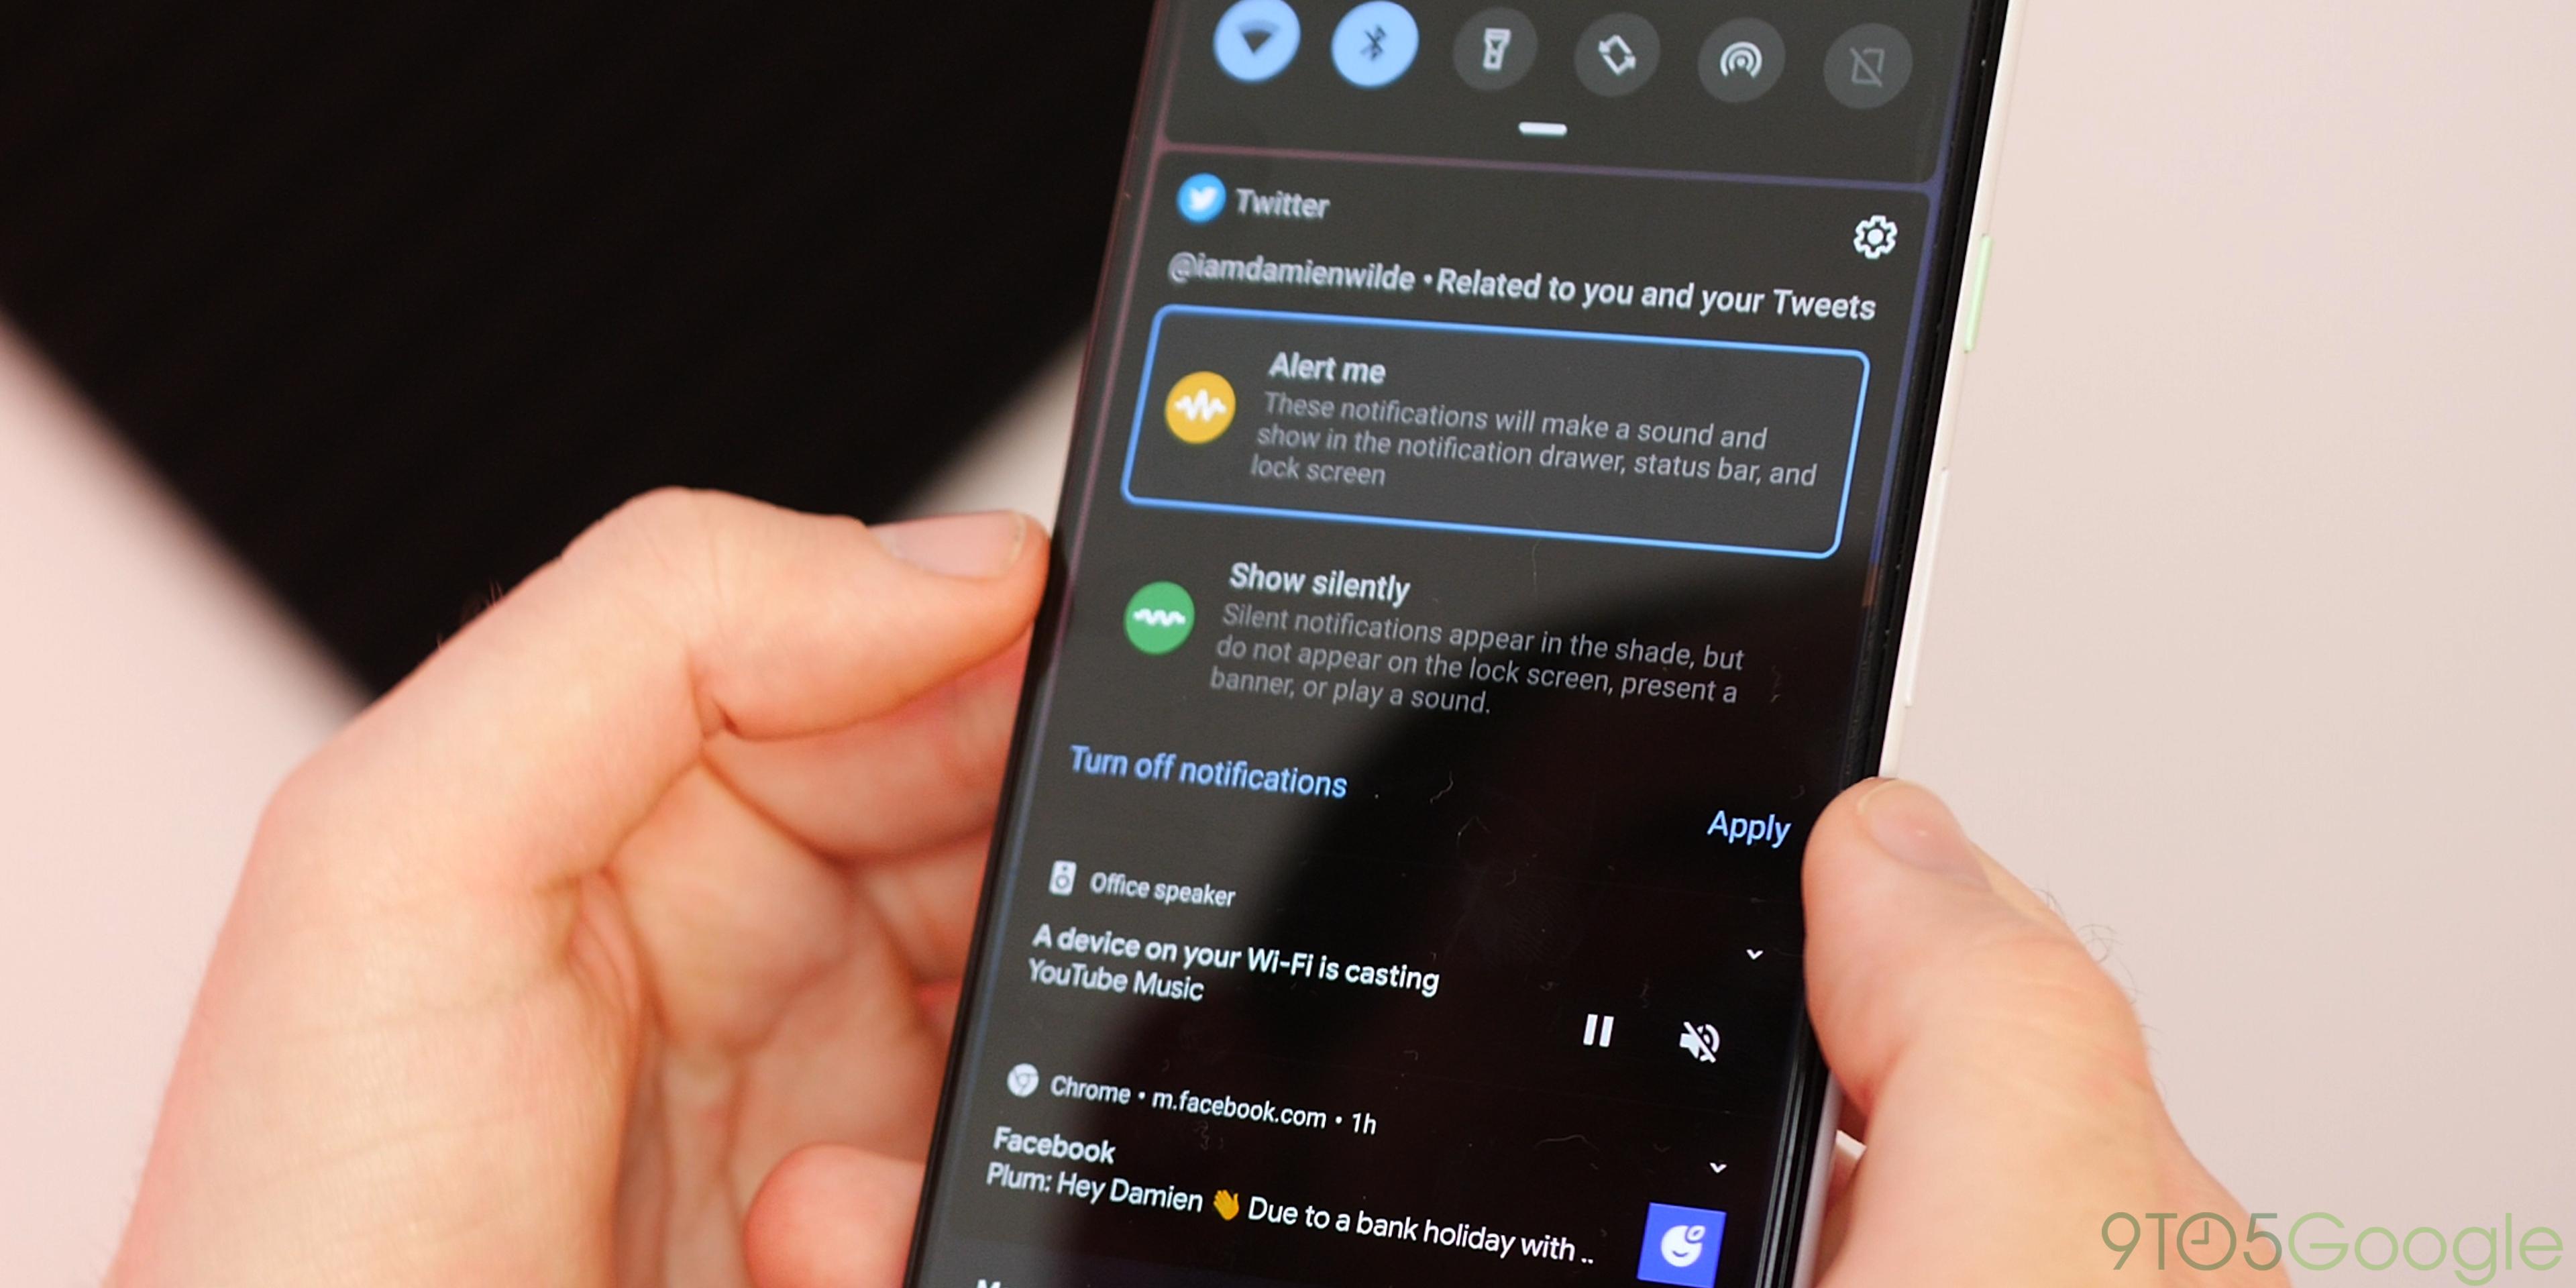 Android Q Beta 3 notification controls